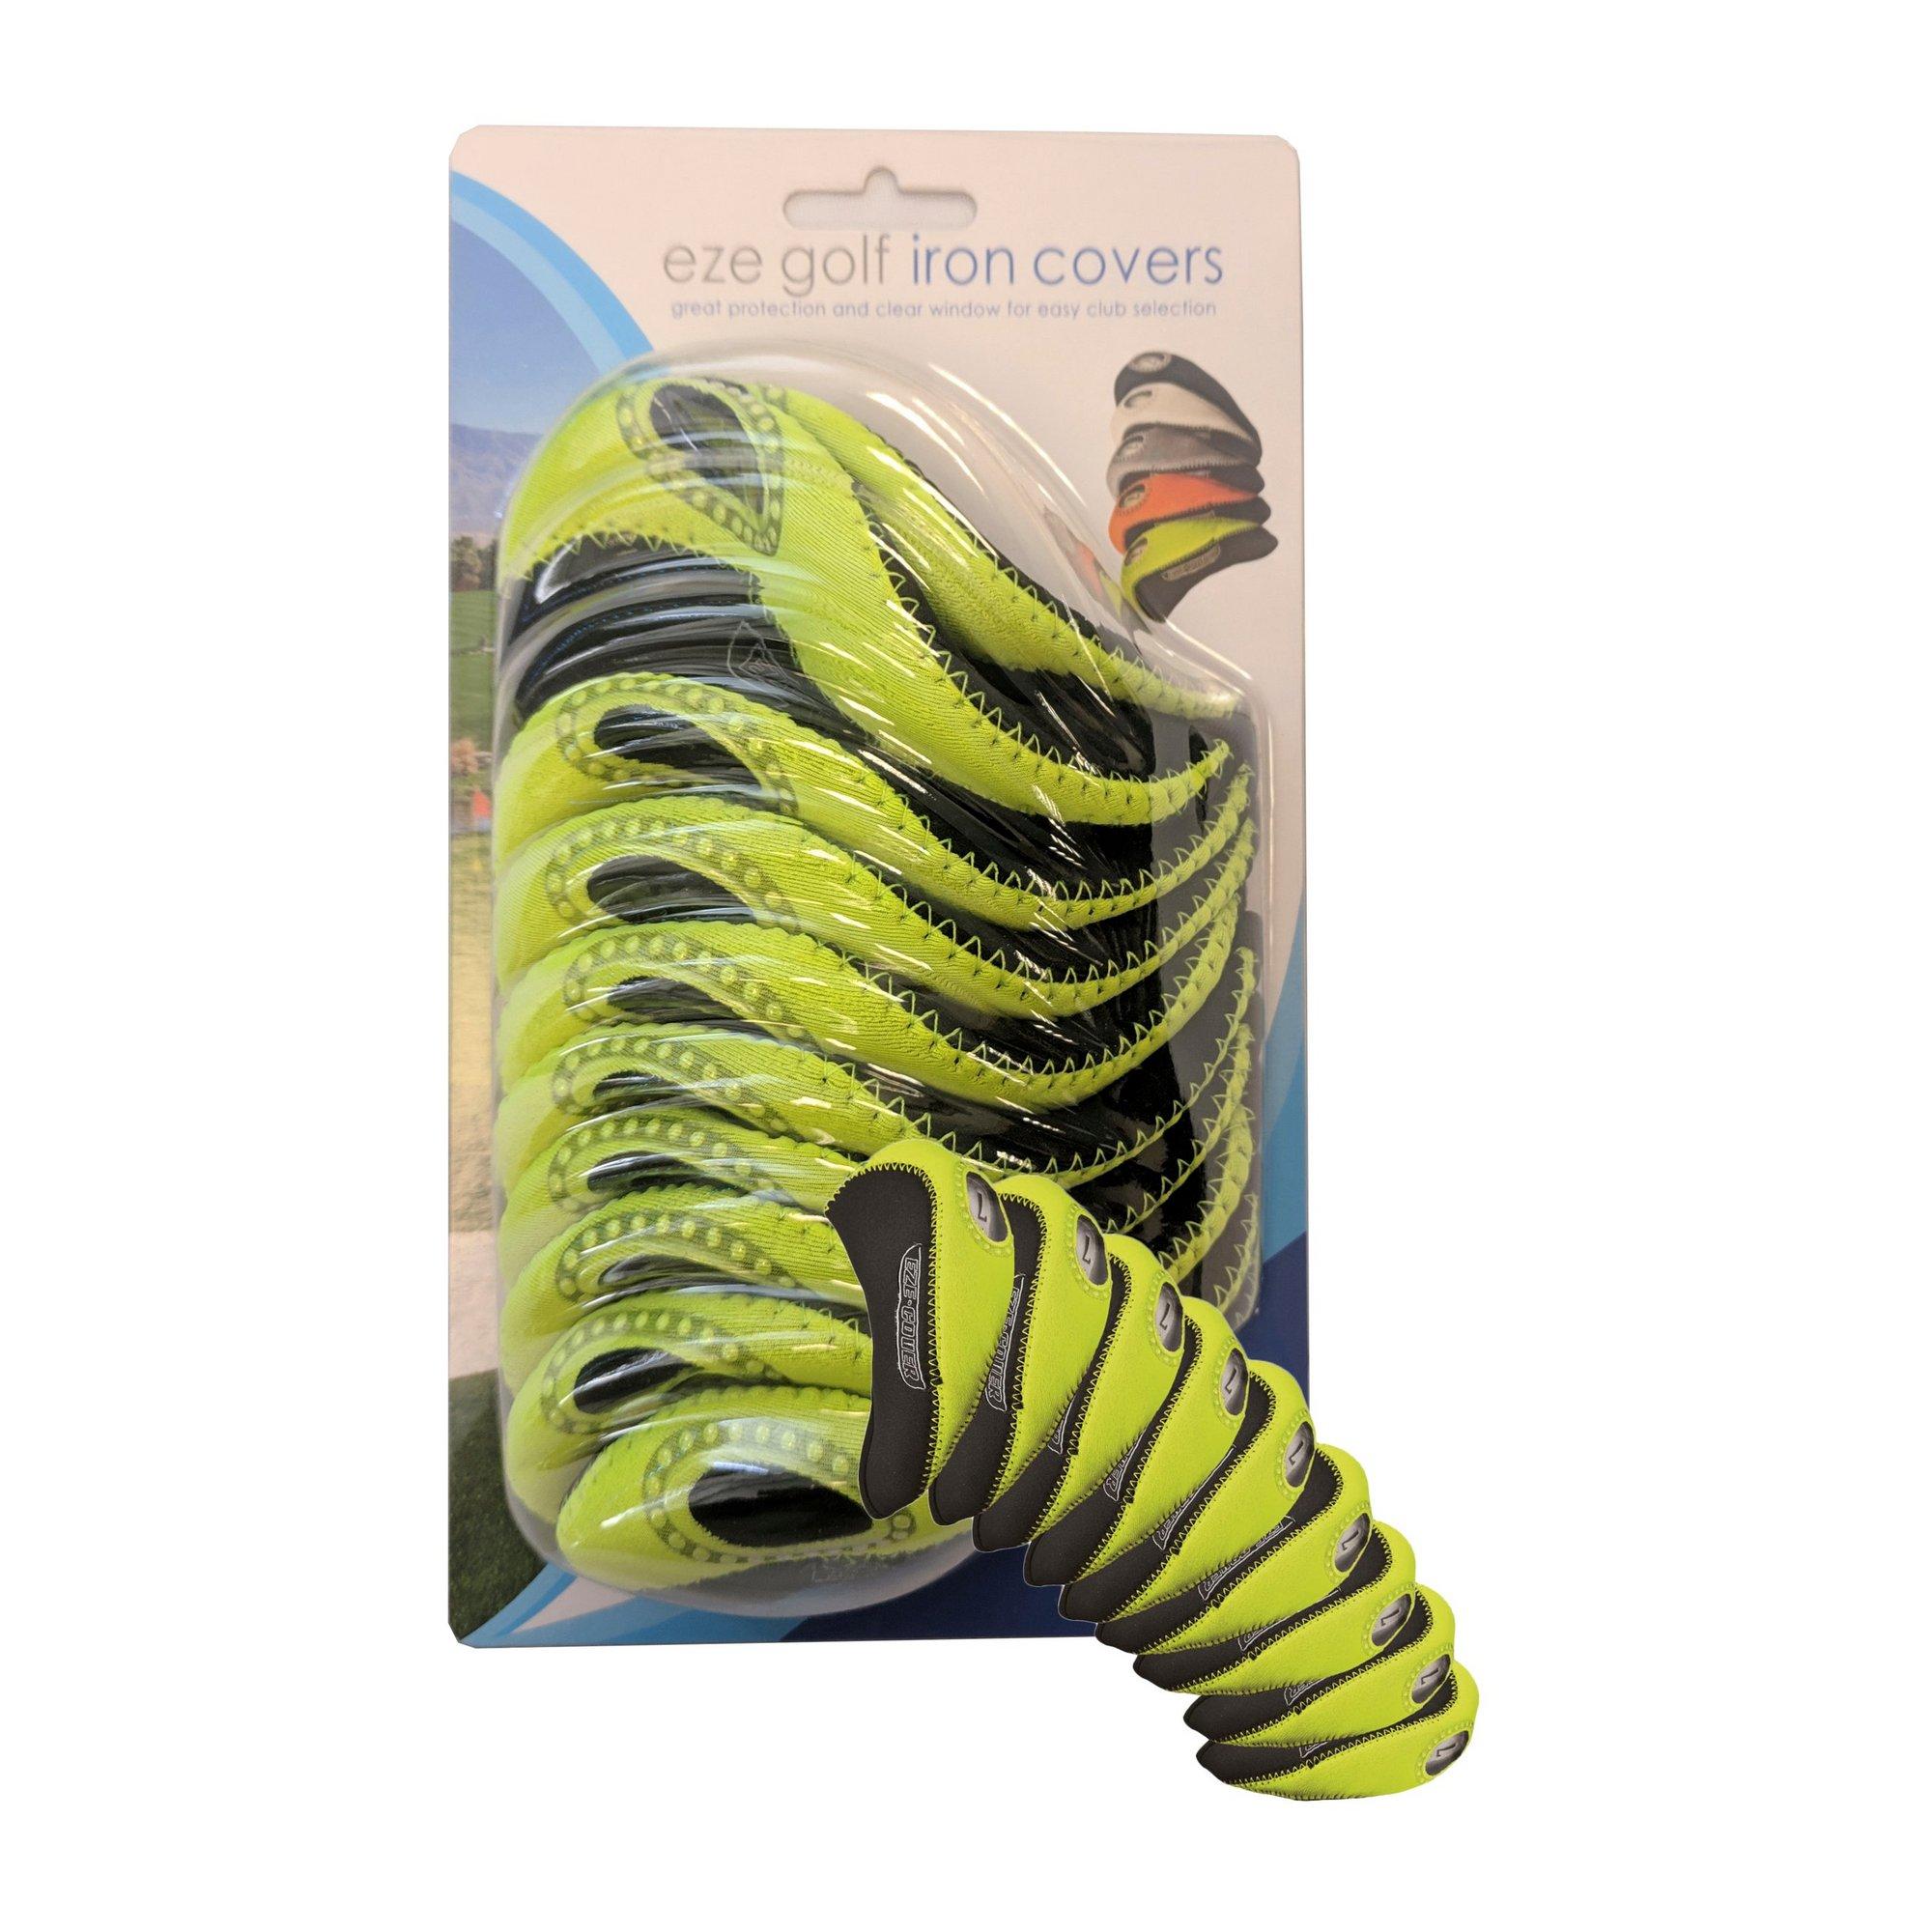 Image of Eze Golf Neoprene Golf Iron Covers